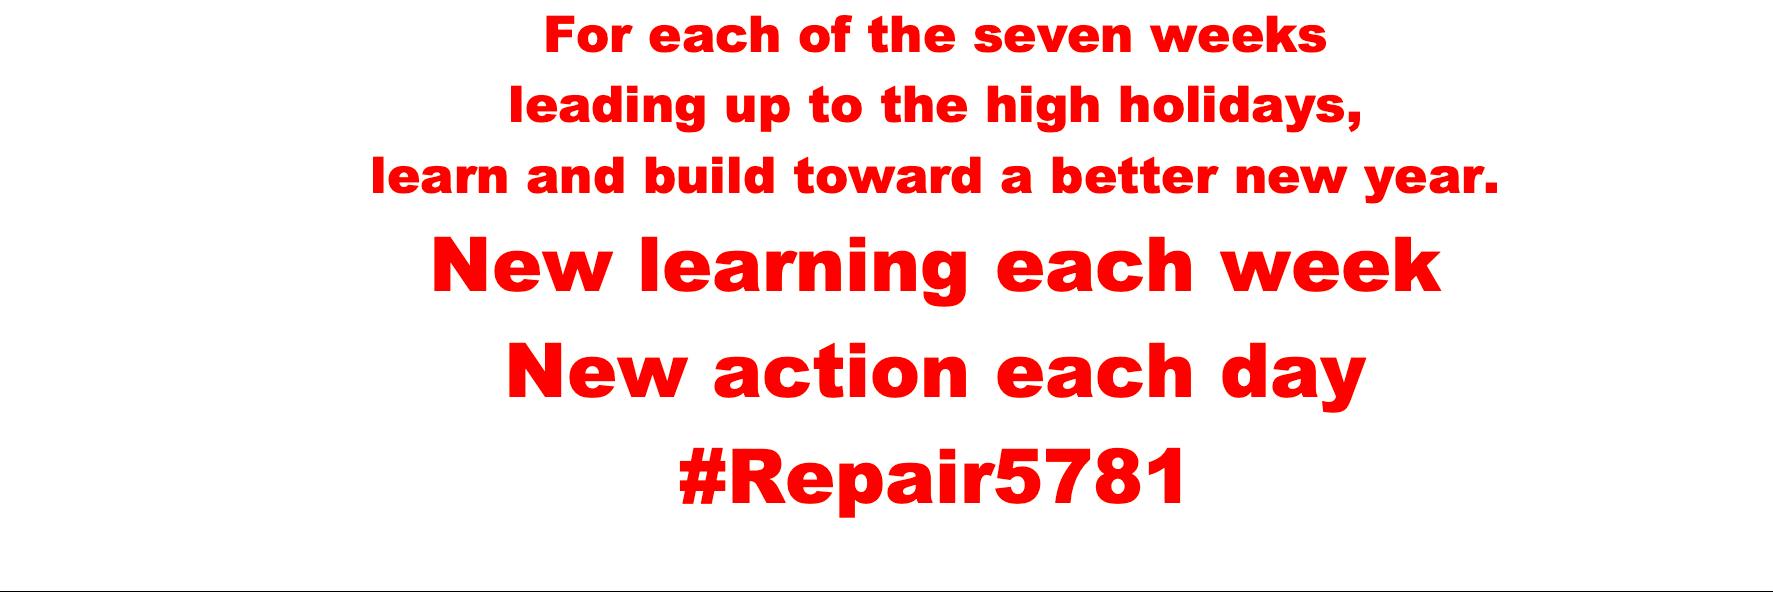 Week 1, Day 1 #Repair5781